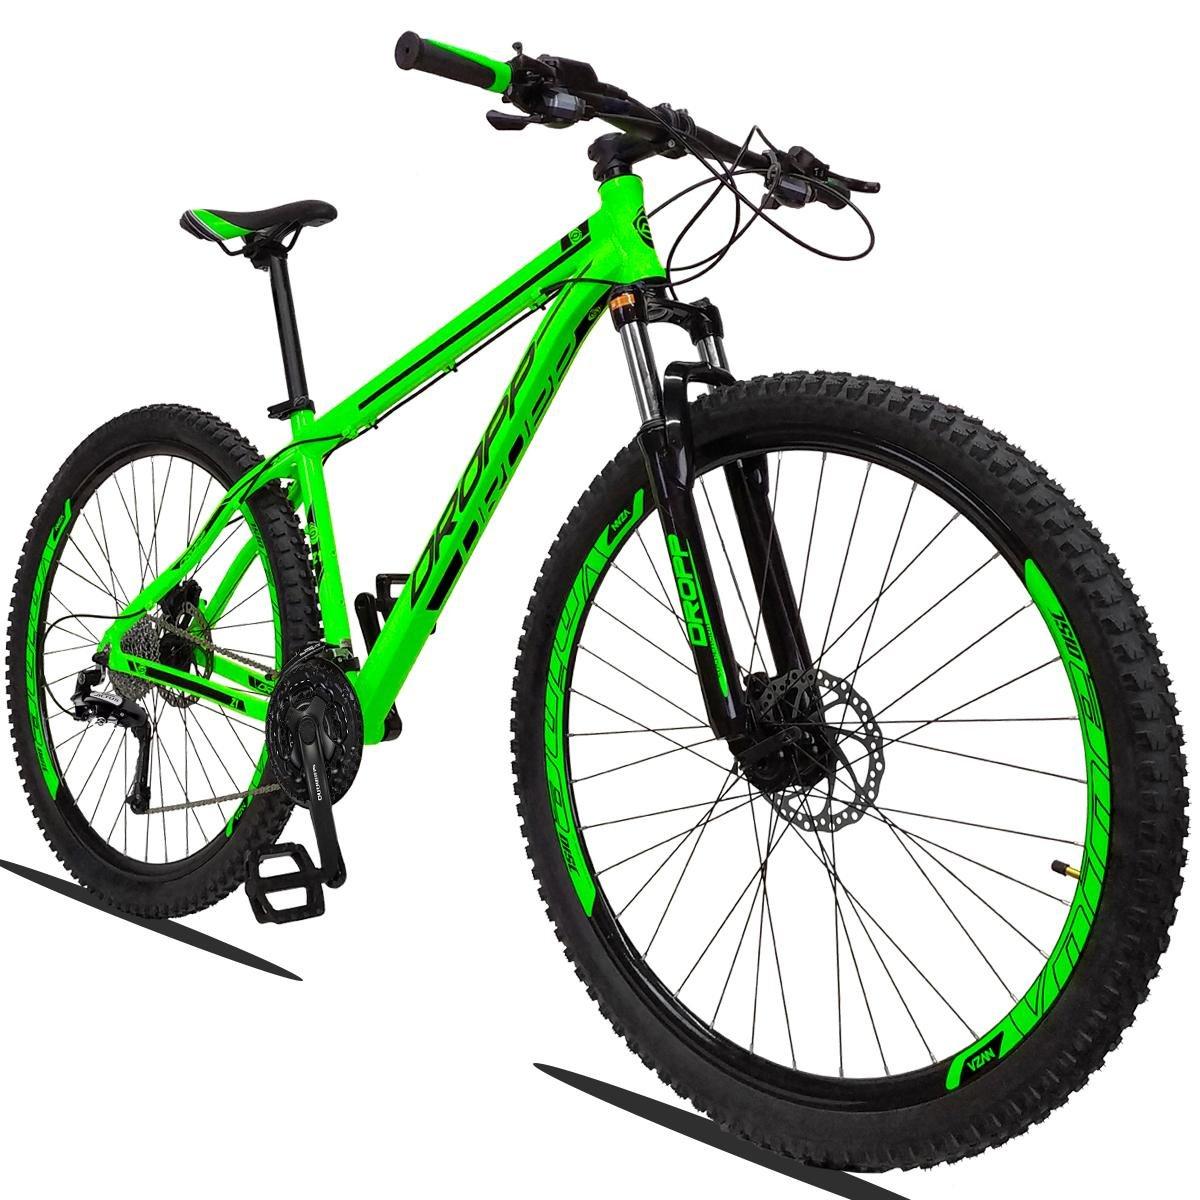 Bicicleta Dropp Z1 T17 Aro 29 Susp. Dianteira 24 Marchas - Verde